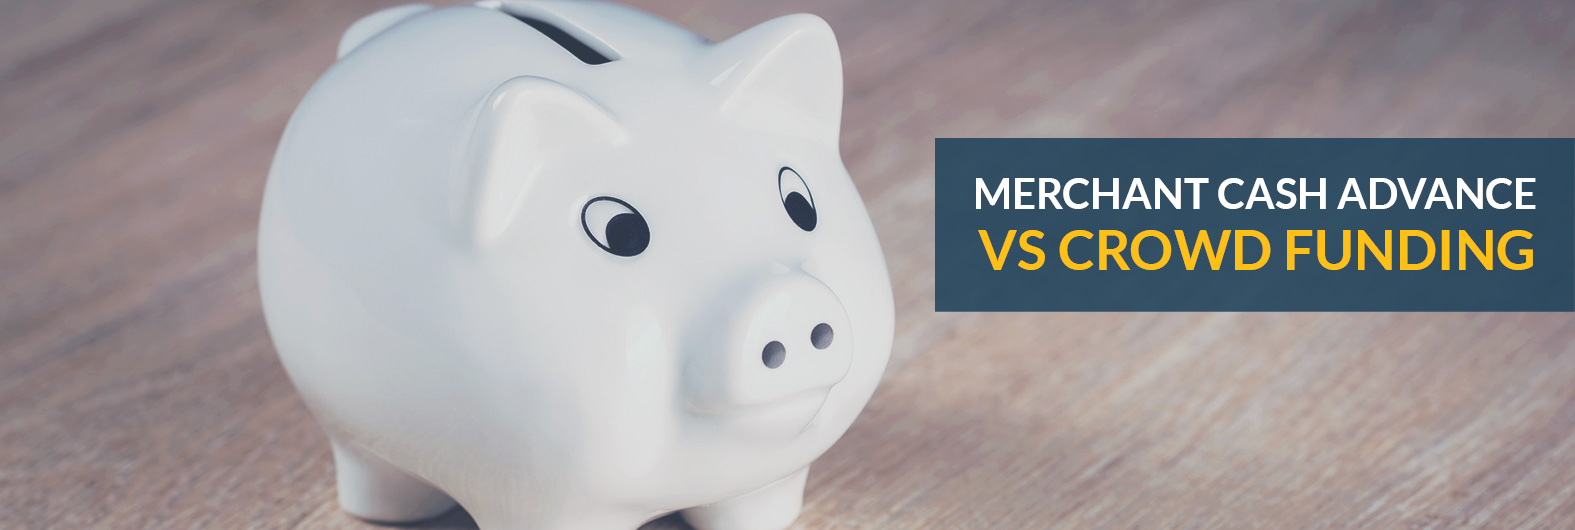 Why amerchant cash advanceis better than crowdfunding